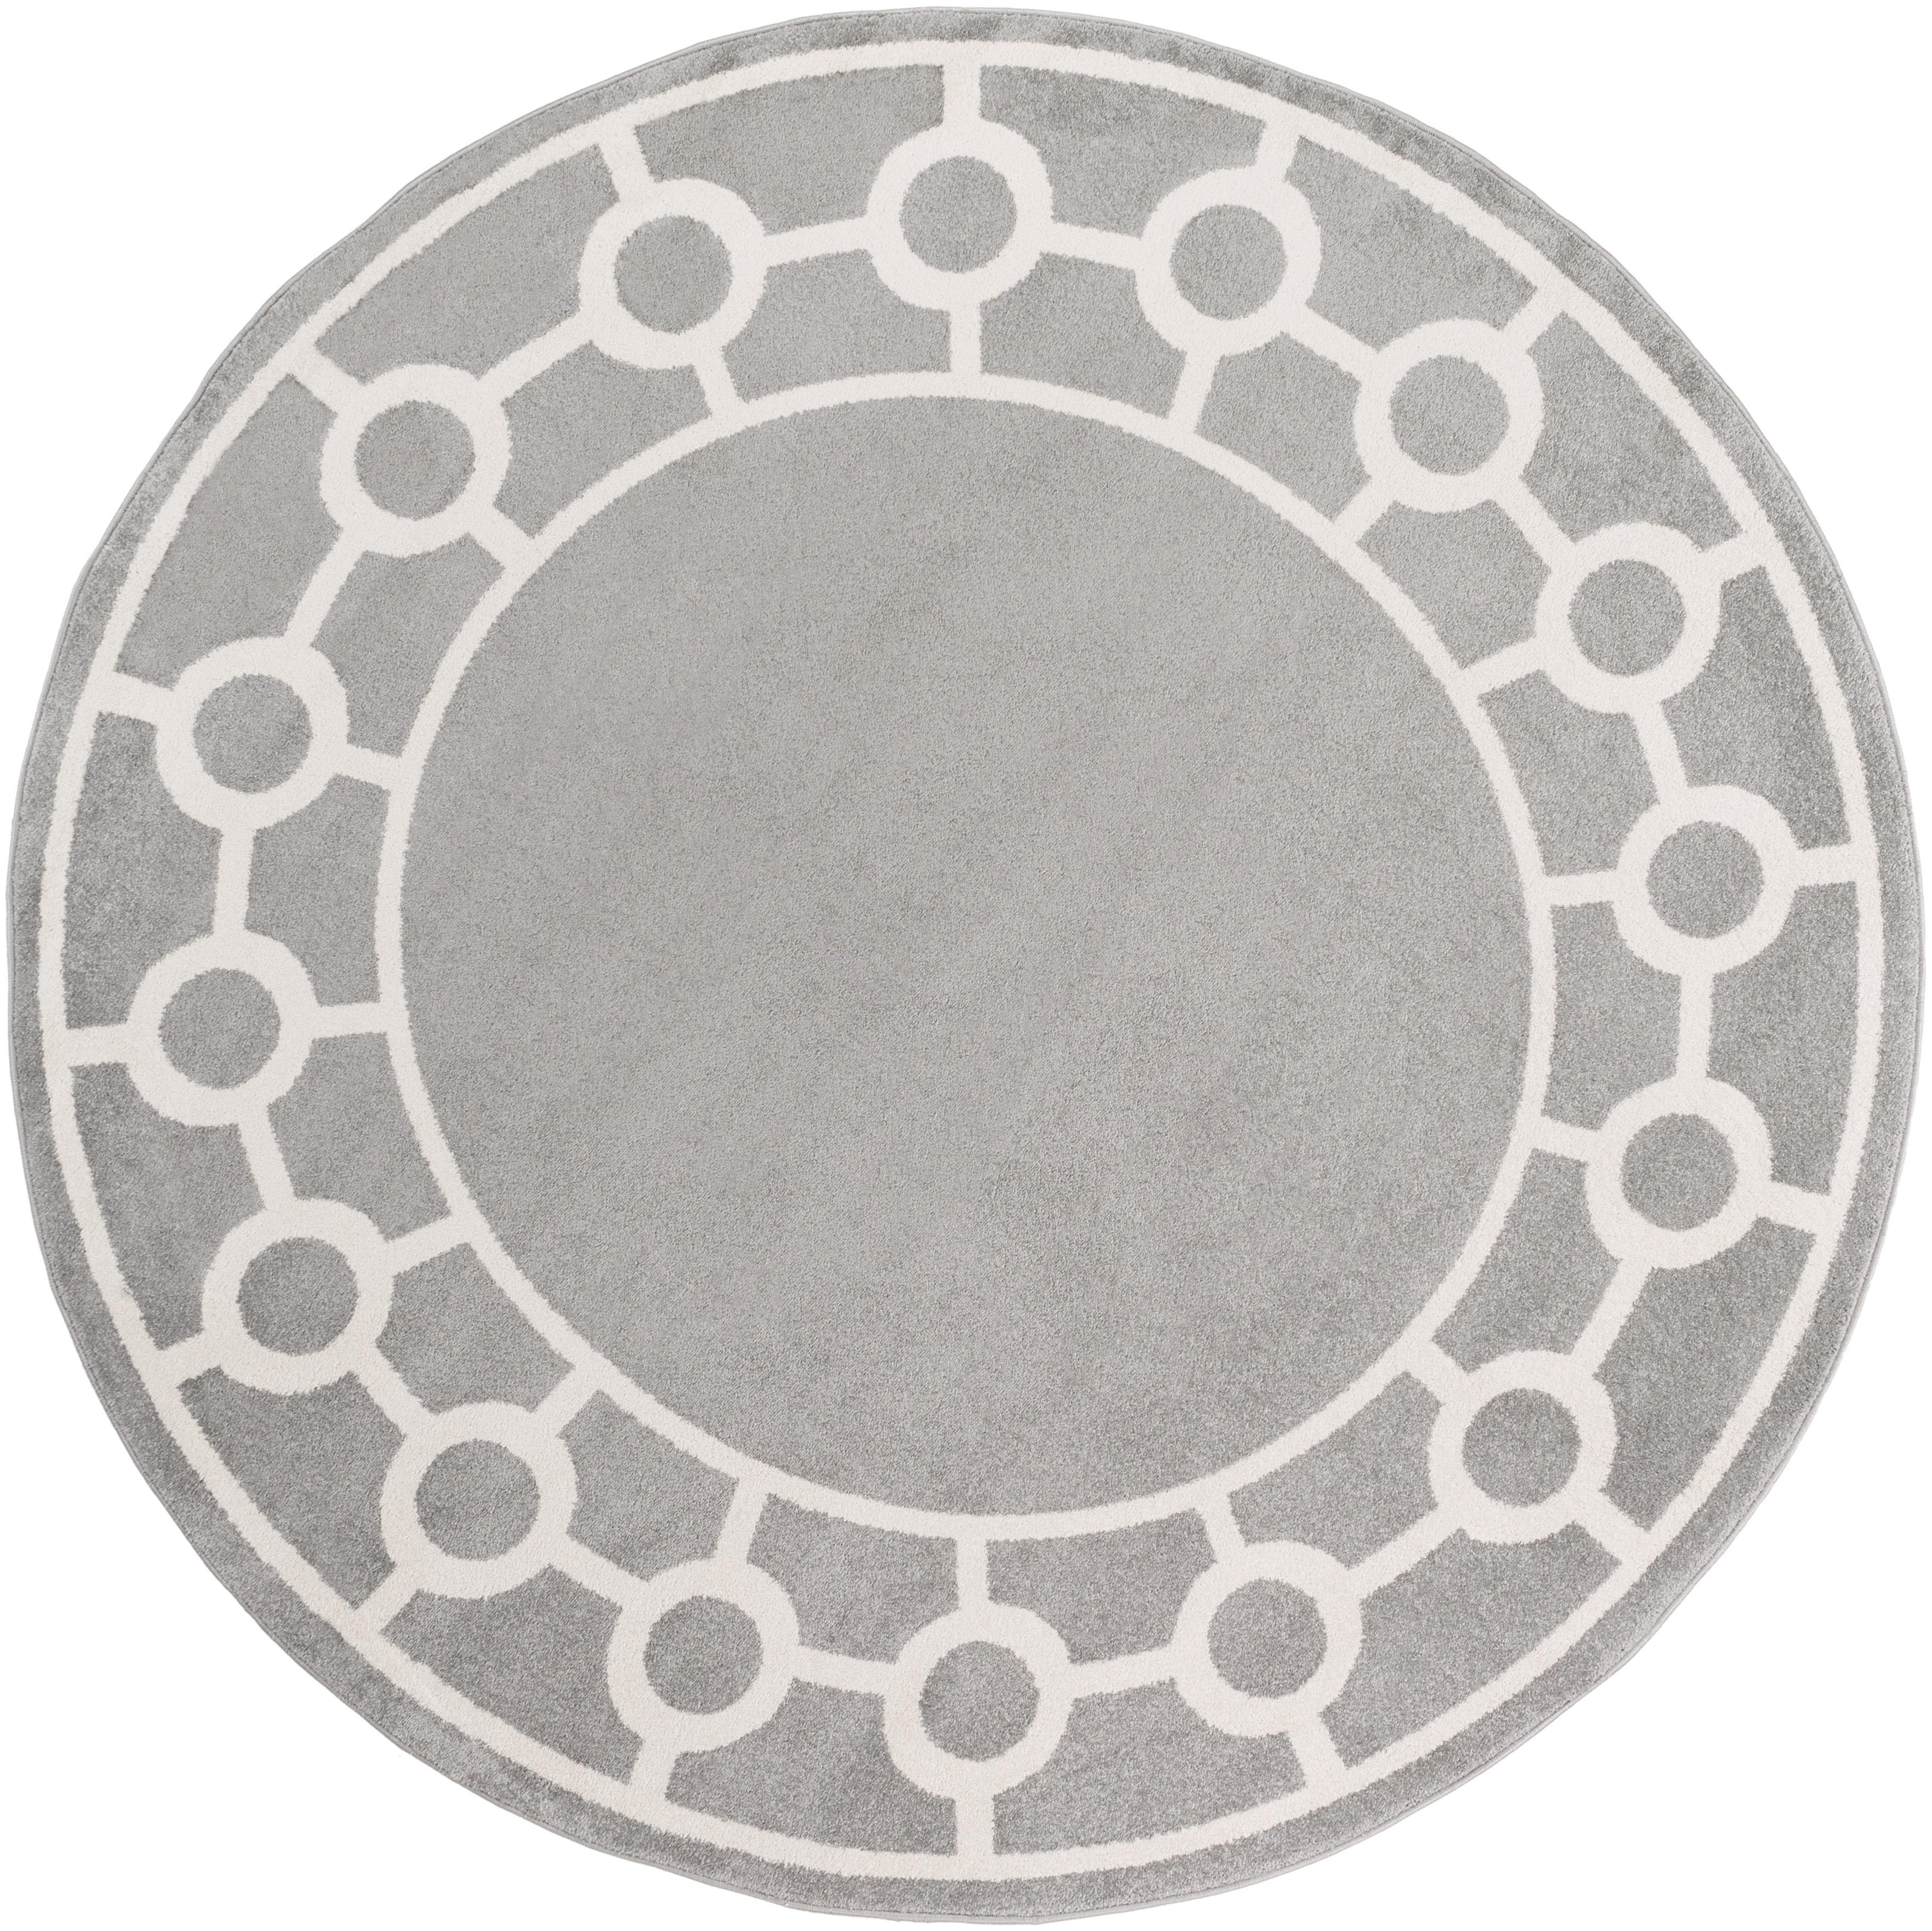 "Surya Horizon 7'10"" Round - Item Number: HRZ1062-710RD"